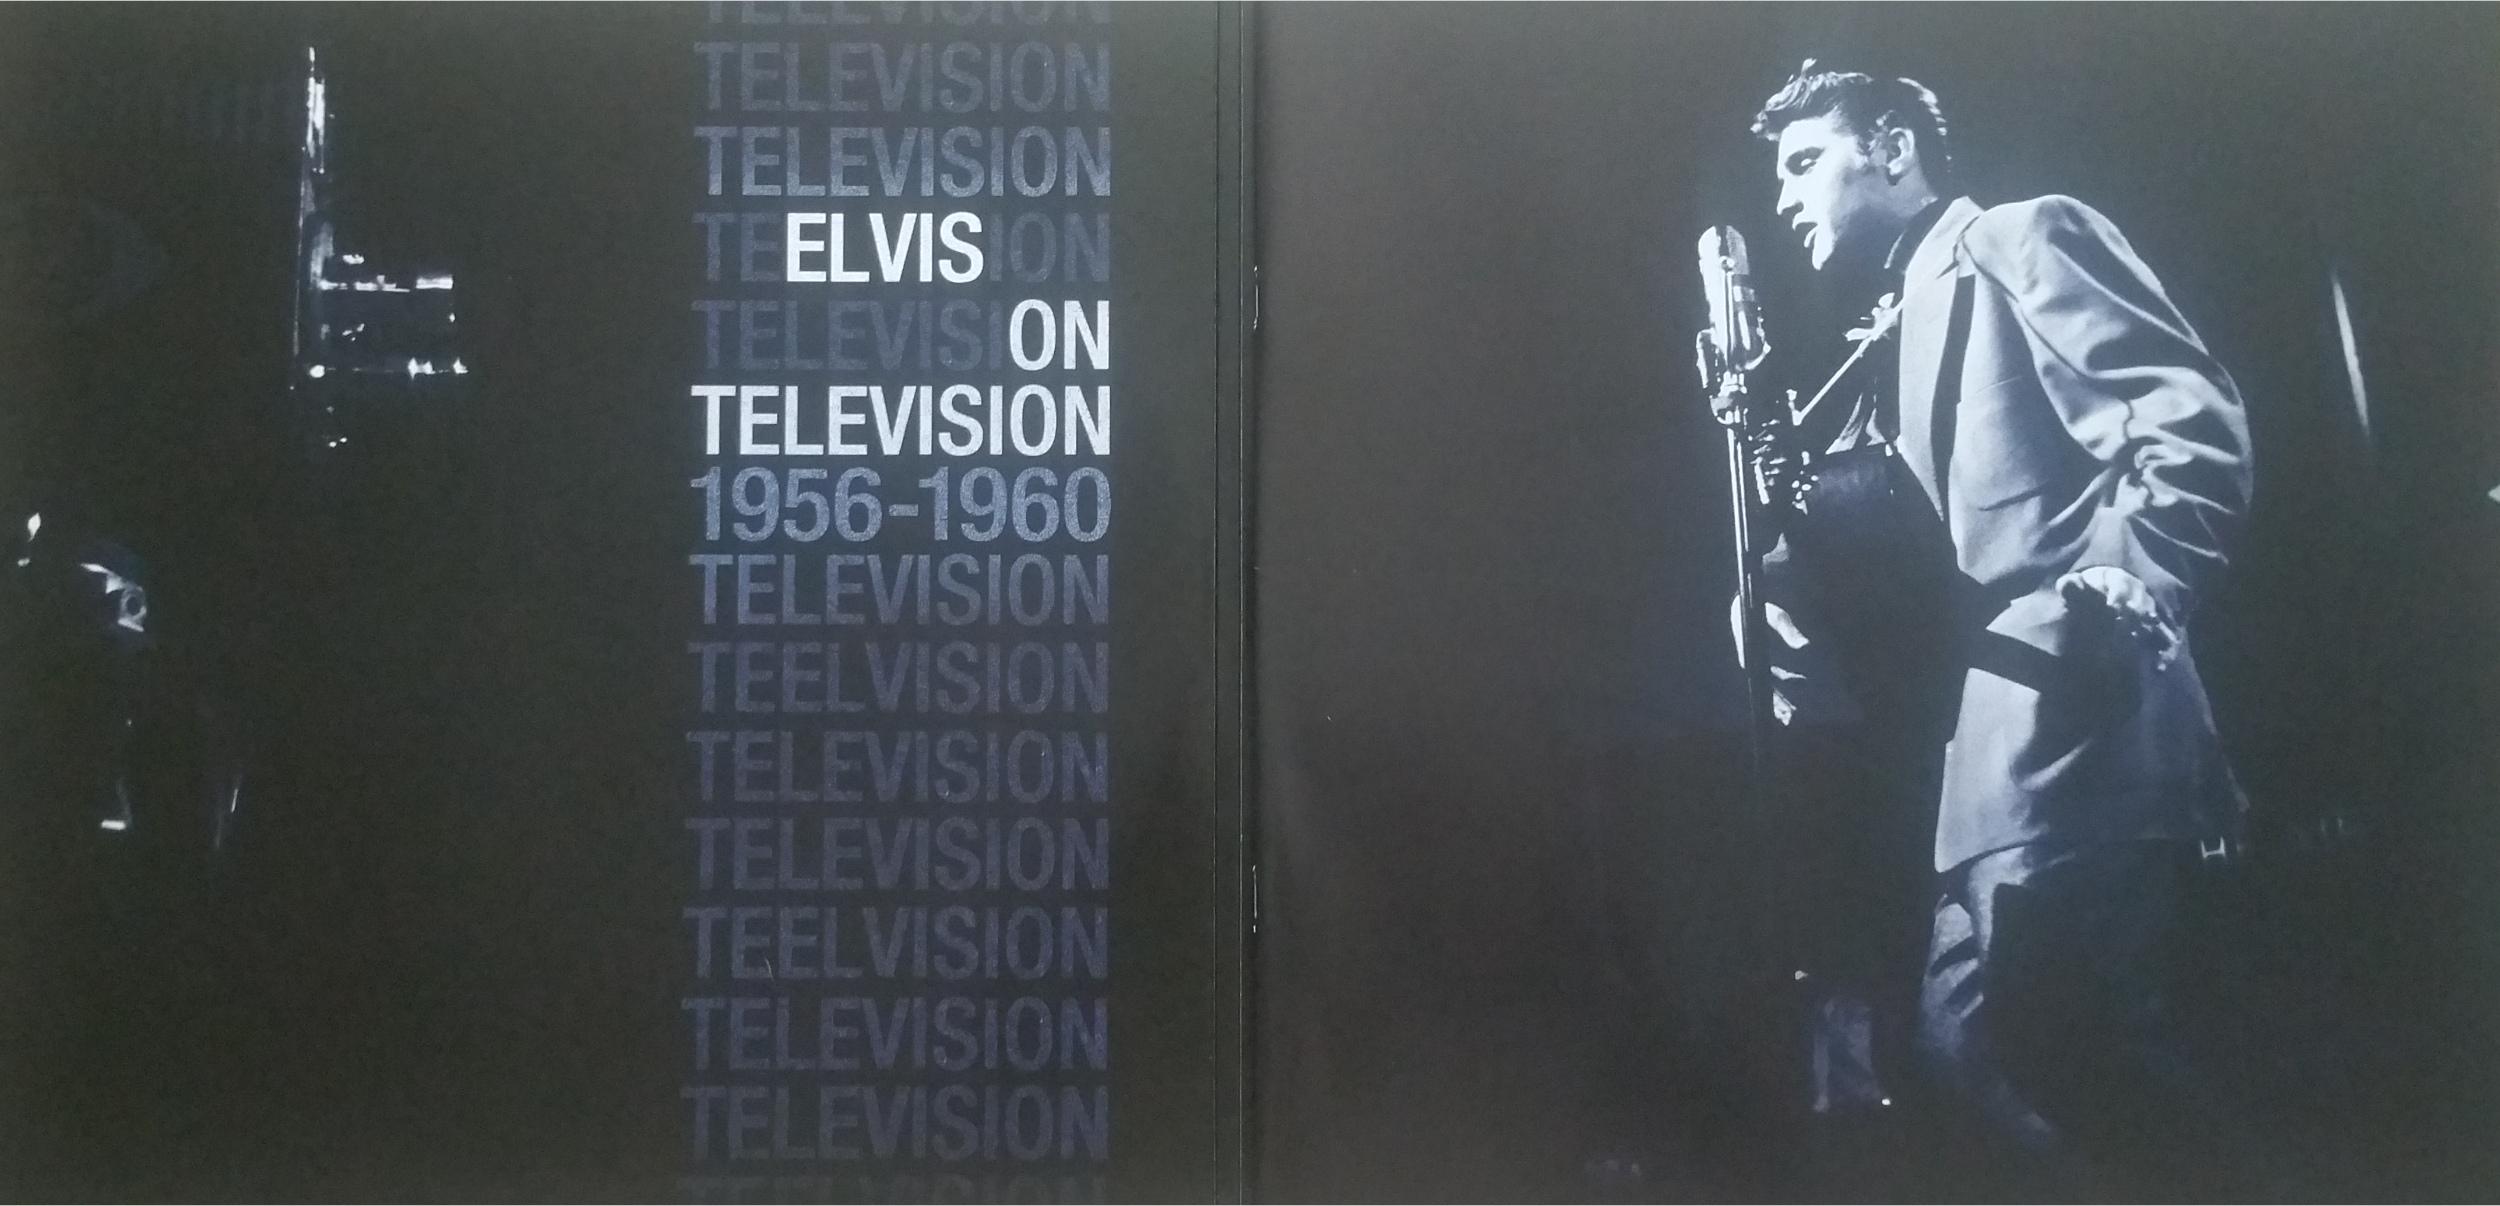 ELVIS ON TELEVISION 1956 - 60 Elvisontv2hyk1o